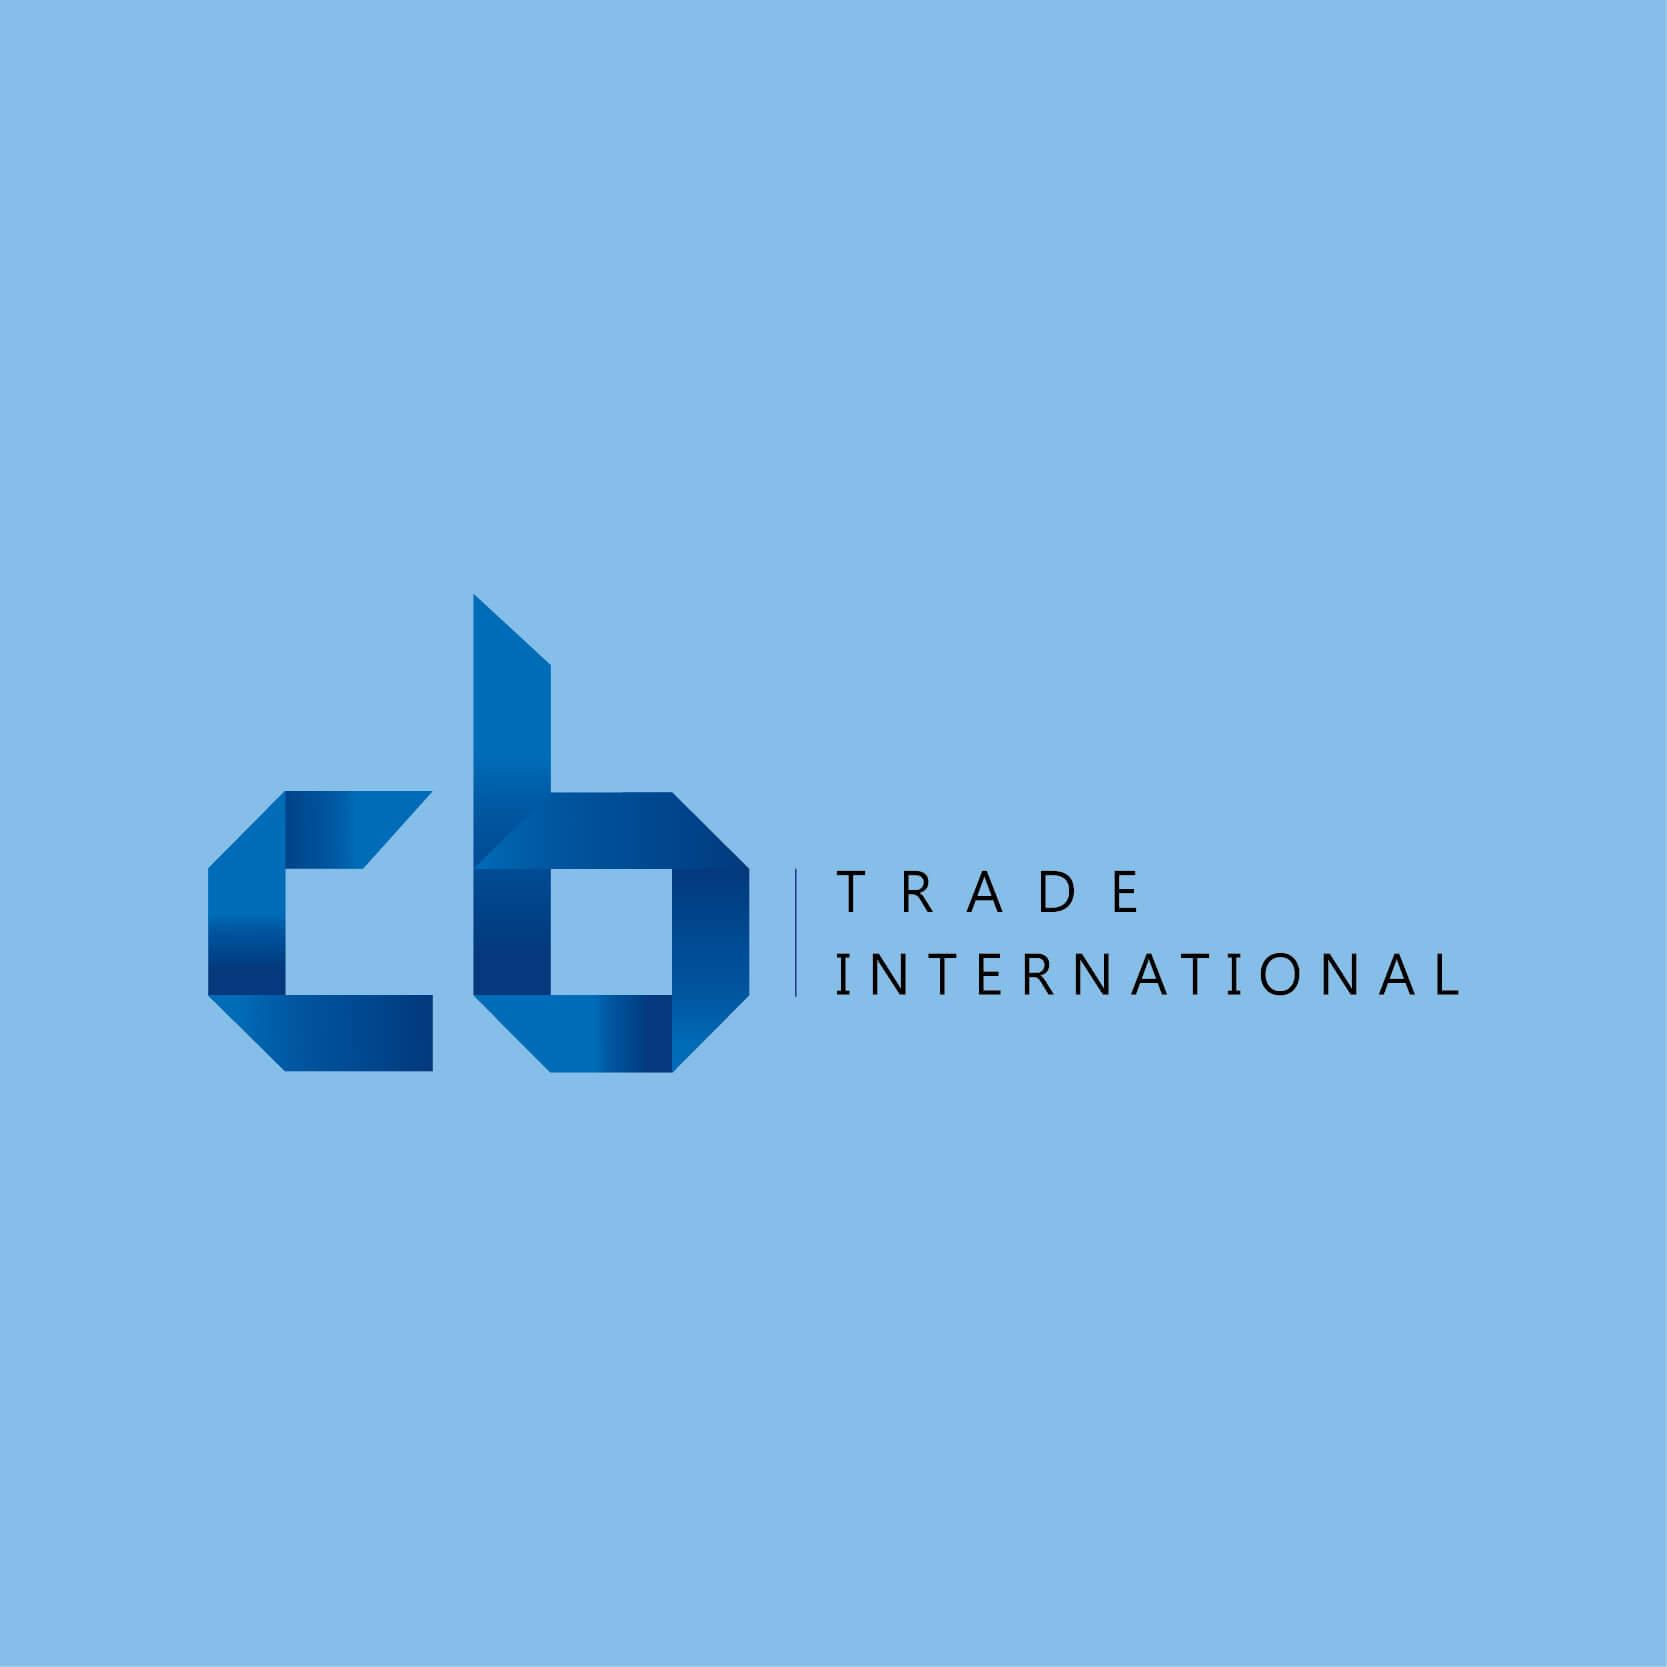 DTC-Clients-Served-Logo-CB Trade International